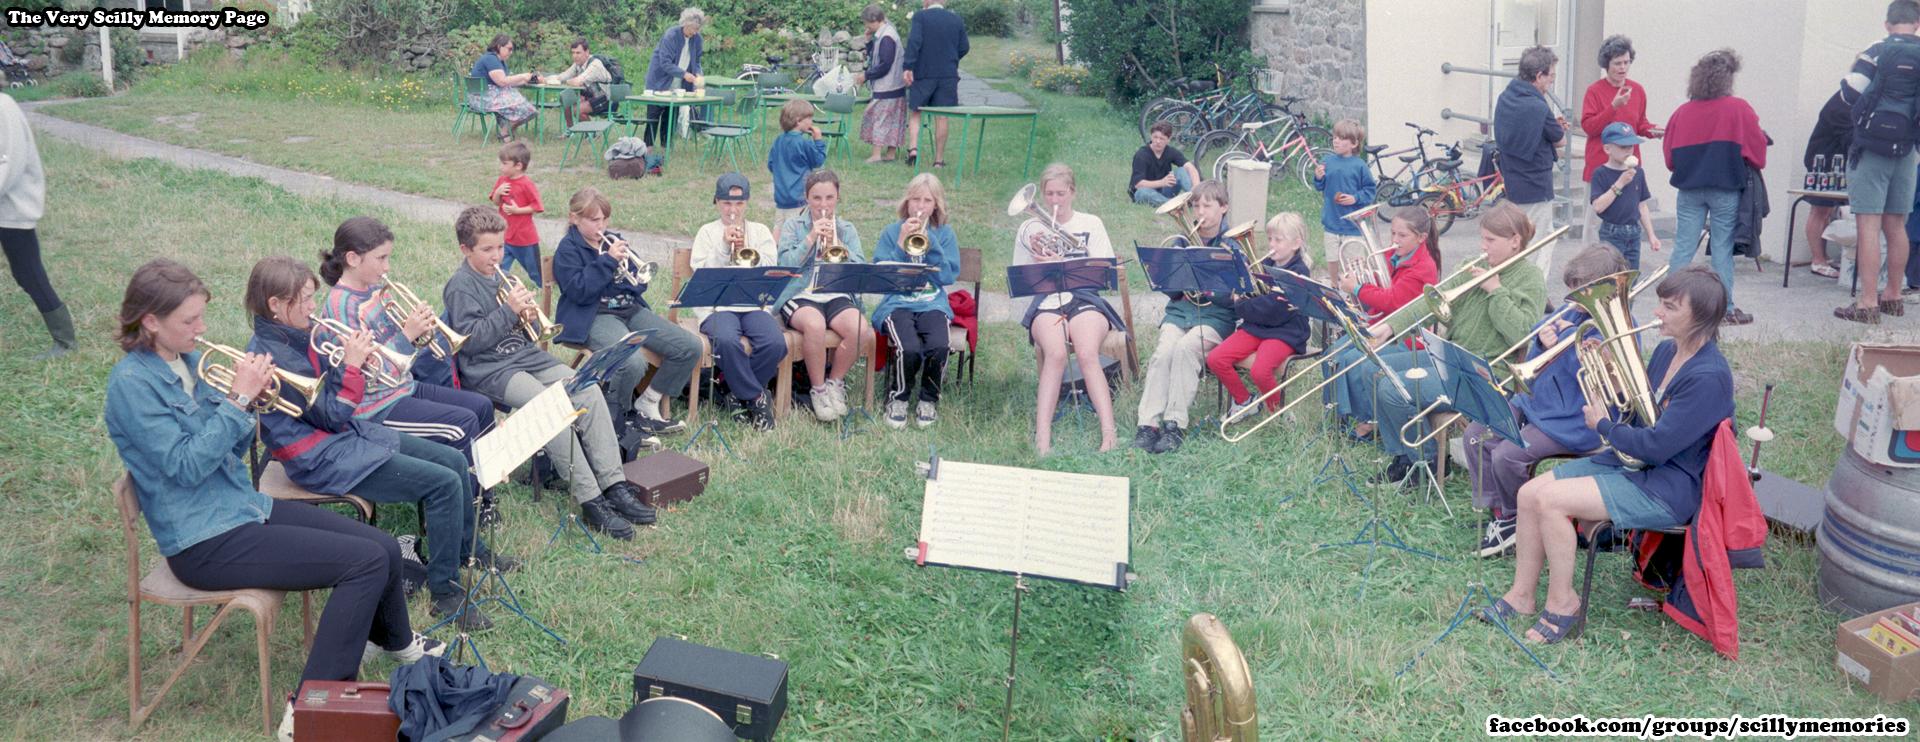 1998, Tresco Fete, Carn Thomas Secondary School band